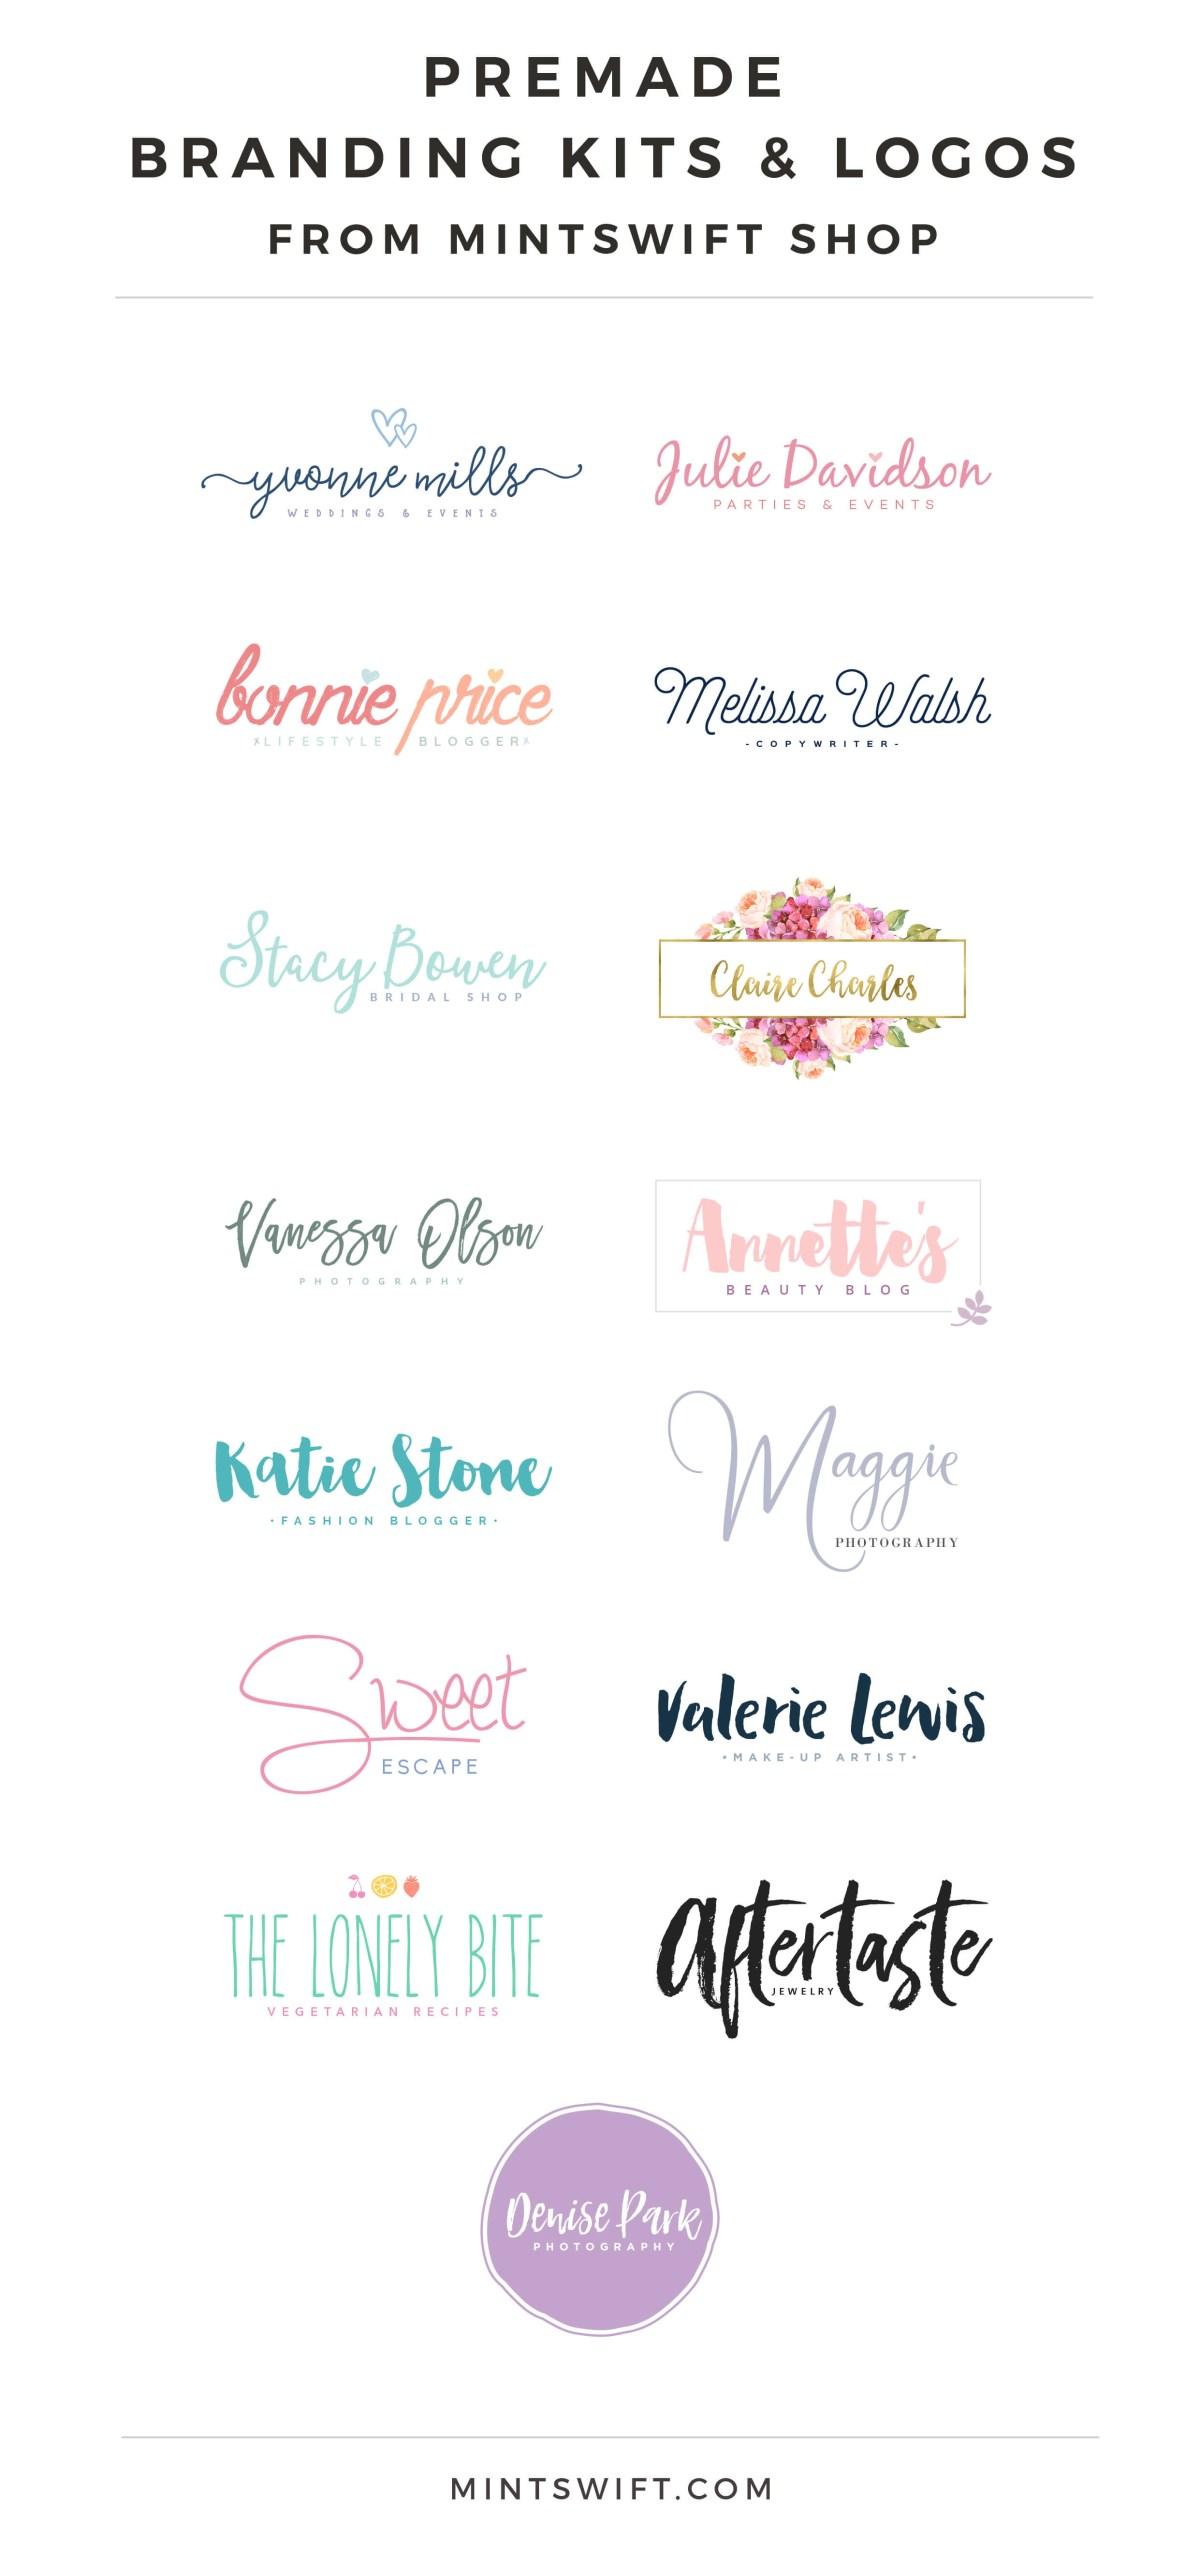 Premade Branding Kits & Premade Logos from MintSwift Shop